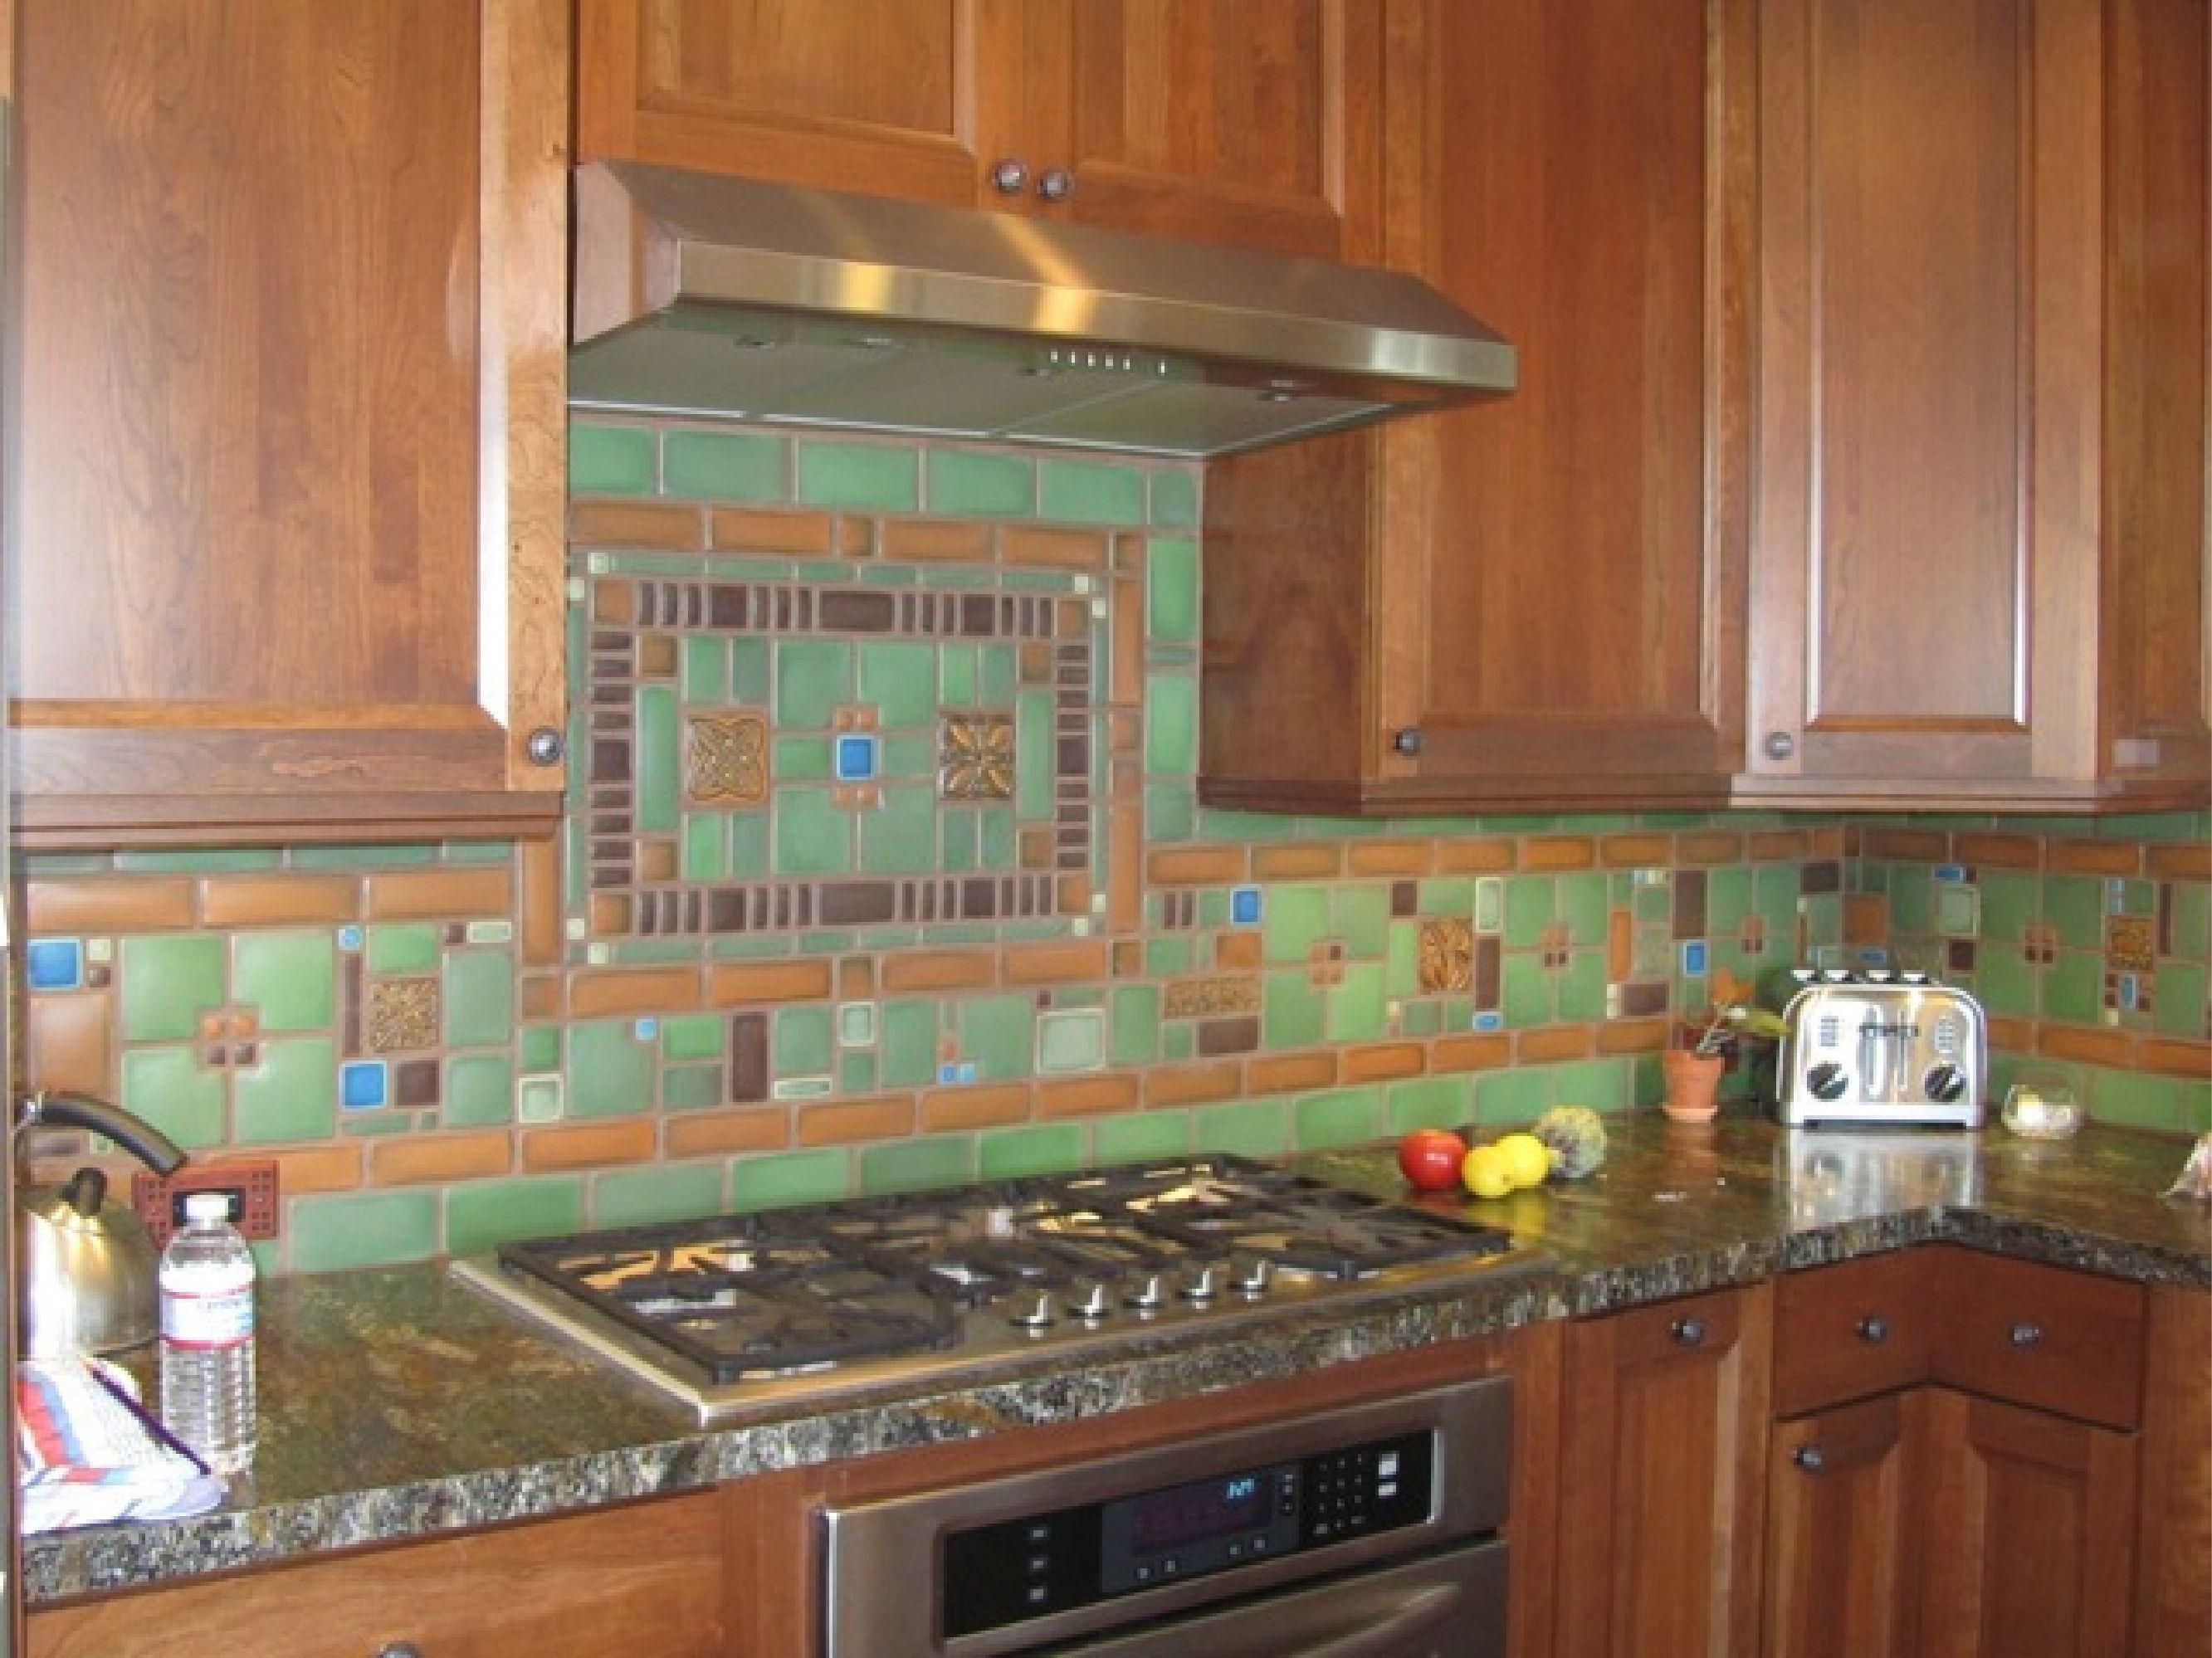 craftsman kitchen backsplash best appliances reviews motawi collage by tom gerardy of